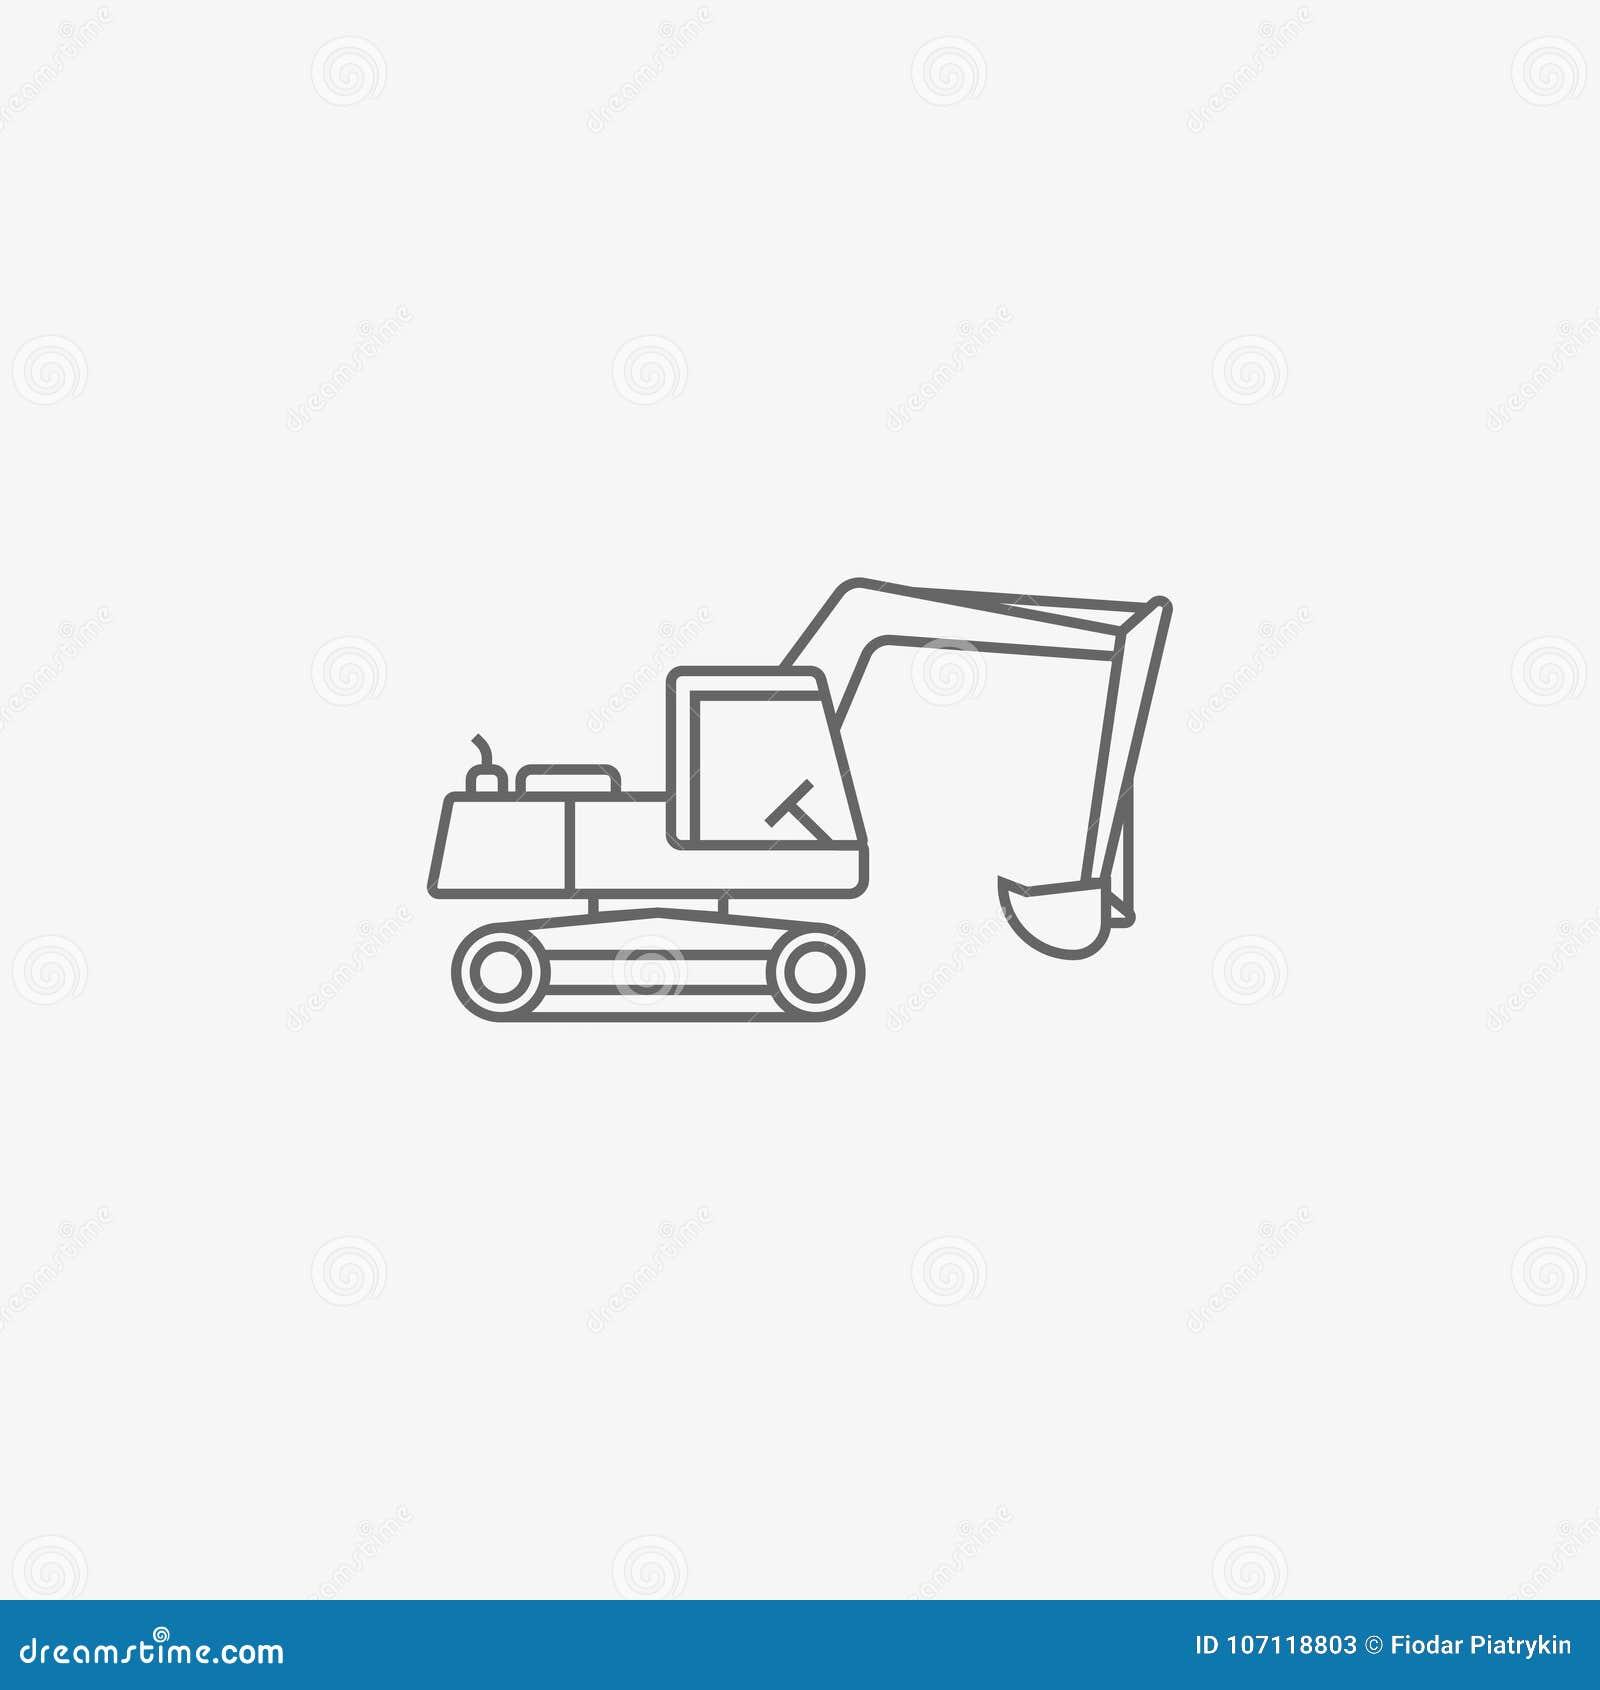 Excavator Vector Icon Stock Illustration Of Excavation